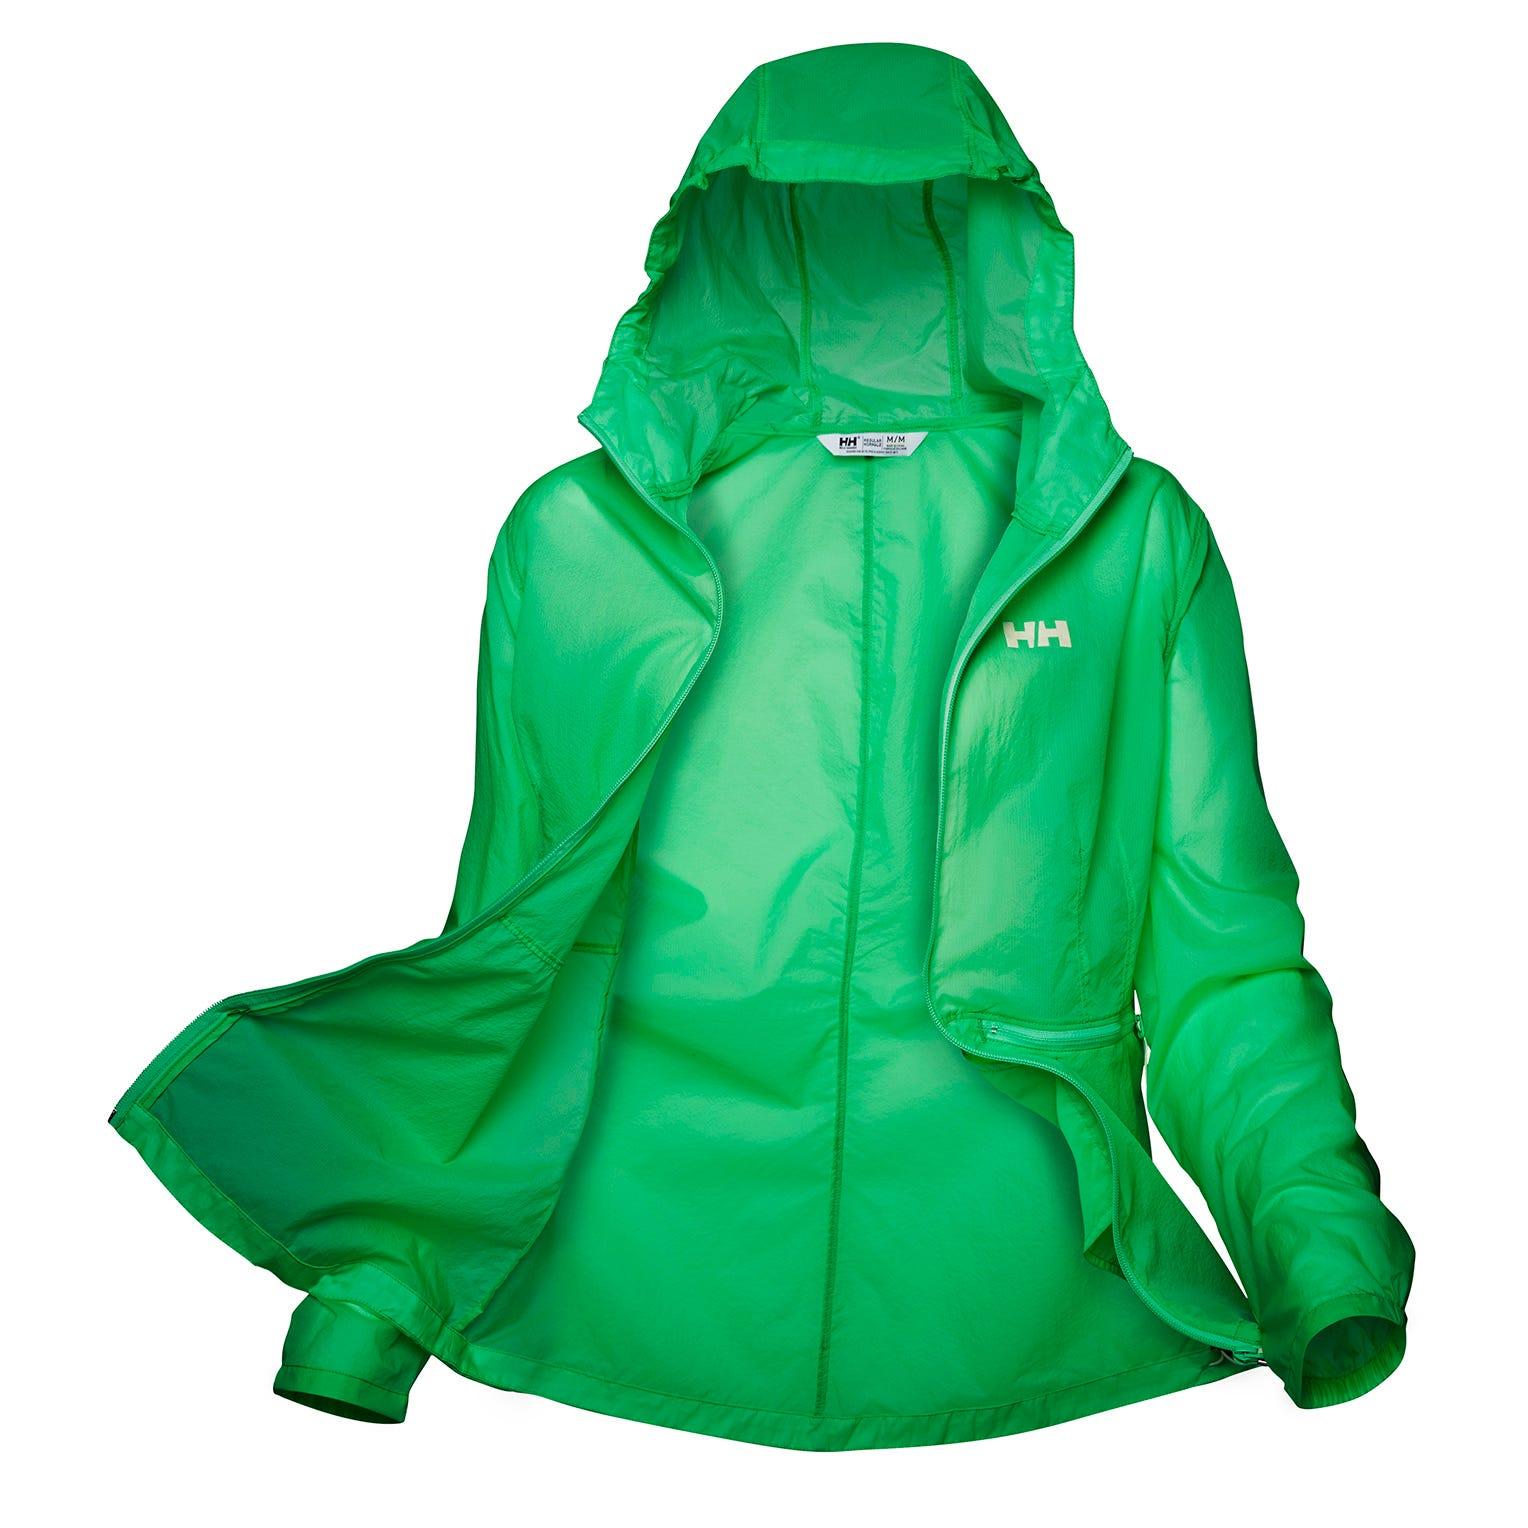 Helly-Hansen Vana Lightweight Windbreaker Jacket with Hood